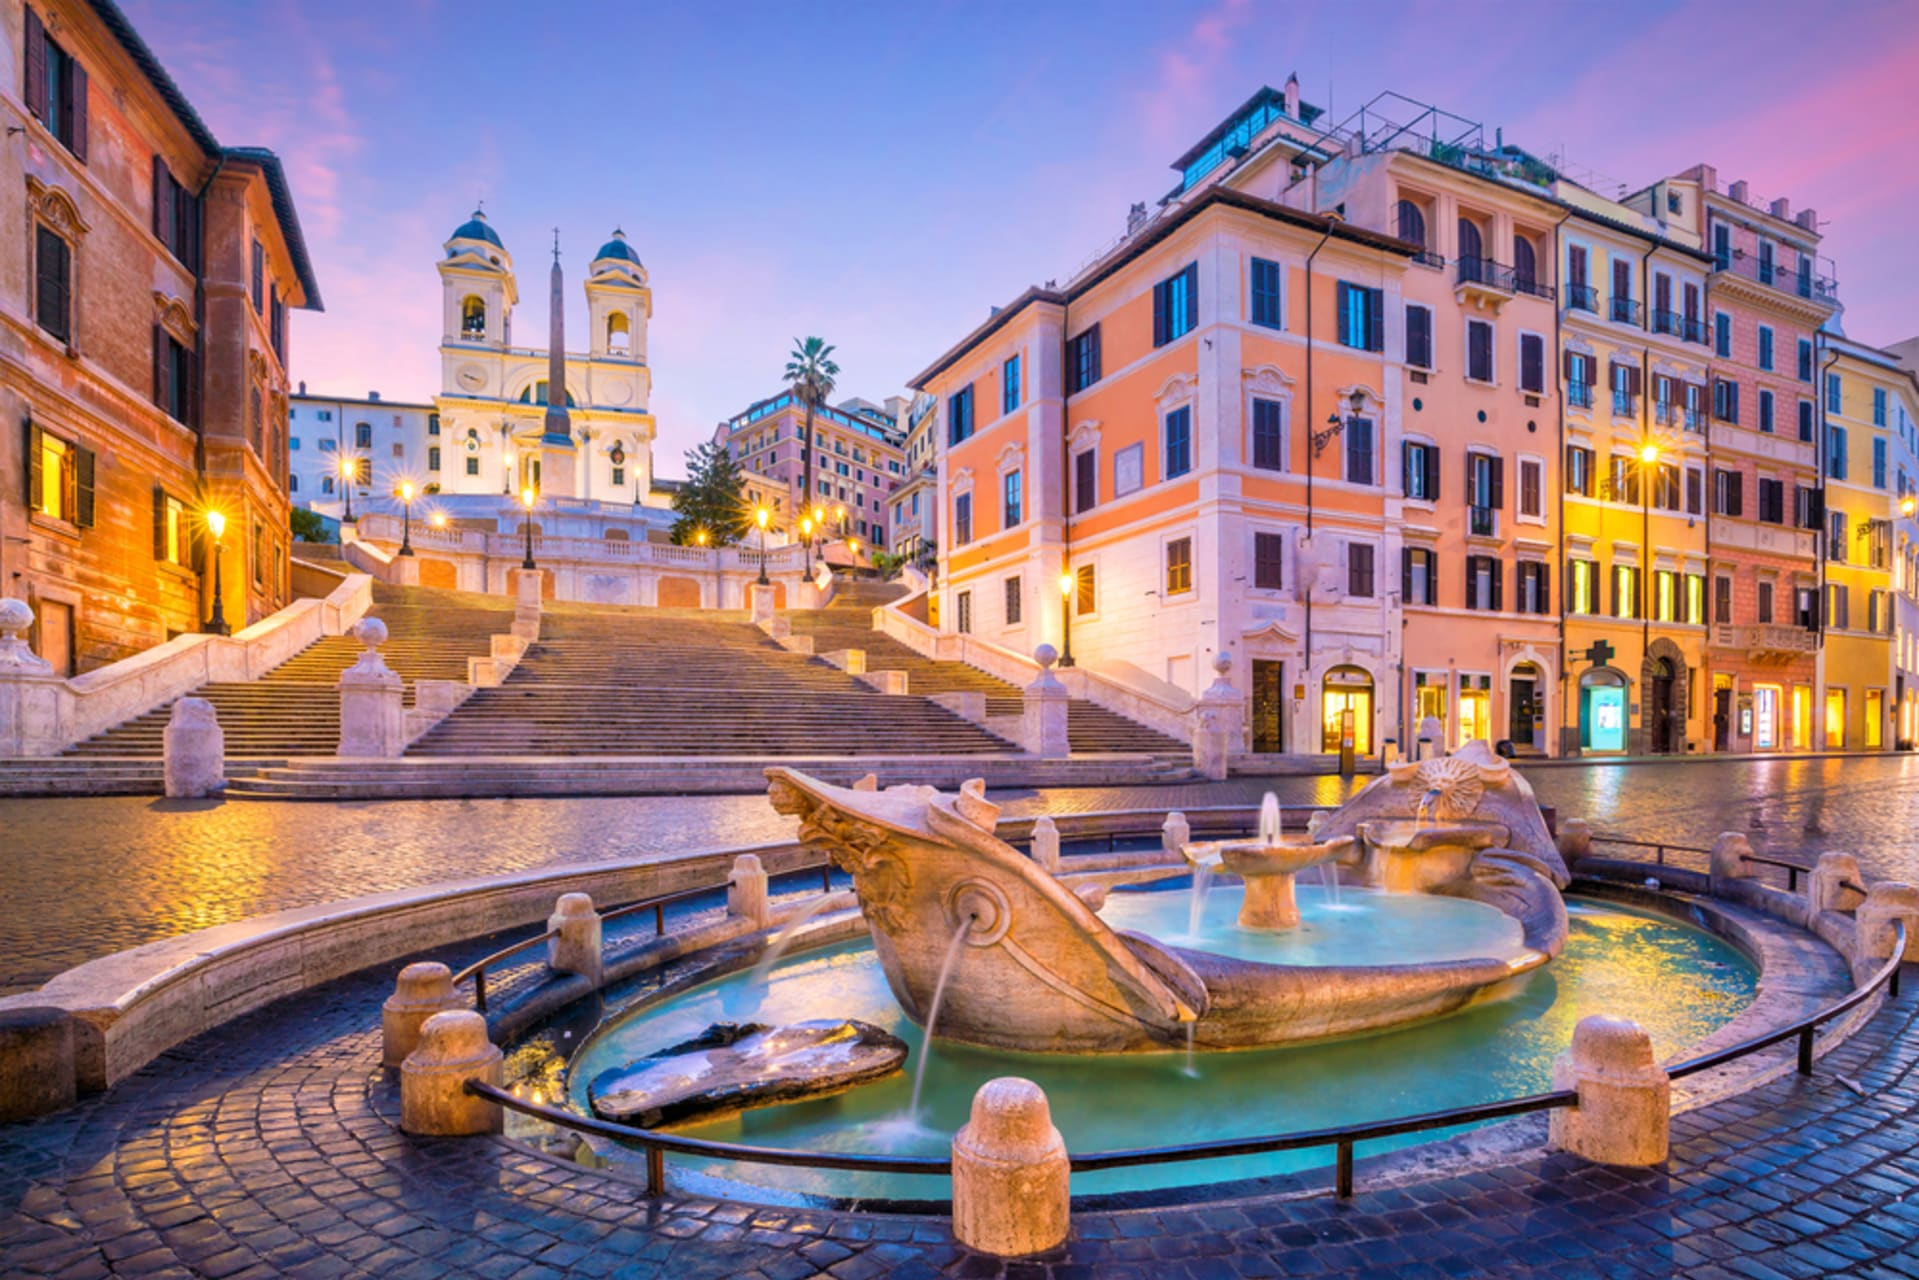 Rome - Spanish Steps and the Italian Fashion Designers Street